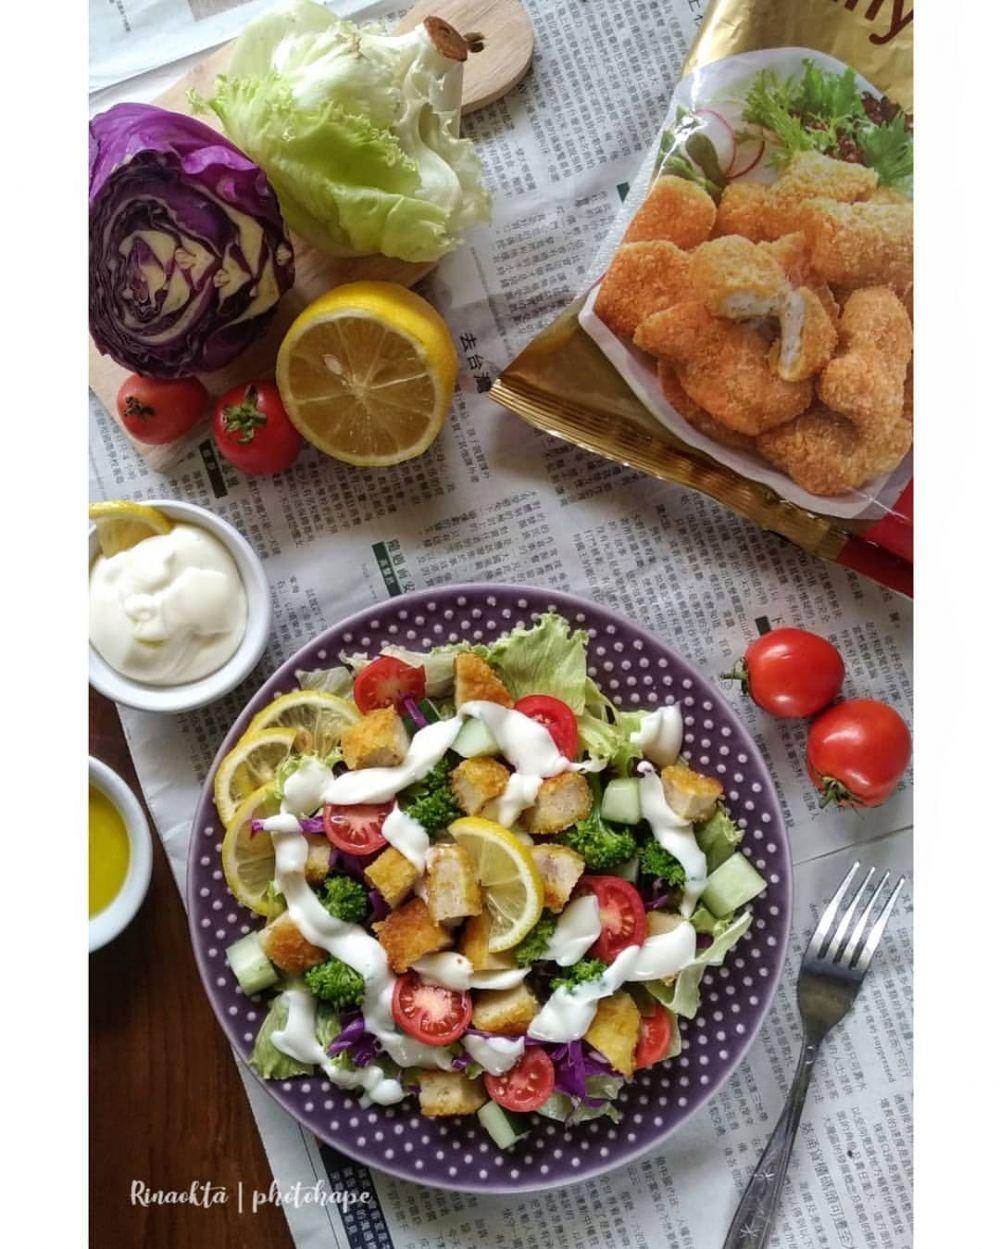 Resep Salad Sayur Instagram Salad Sayur Sayuran Resep Salad